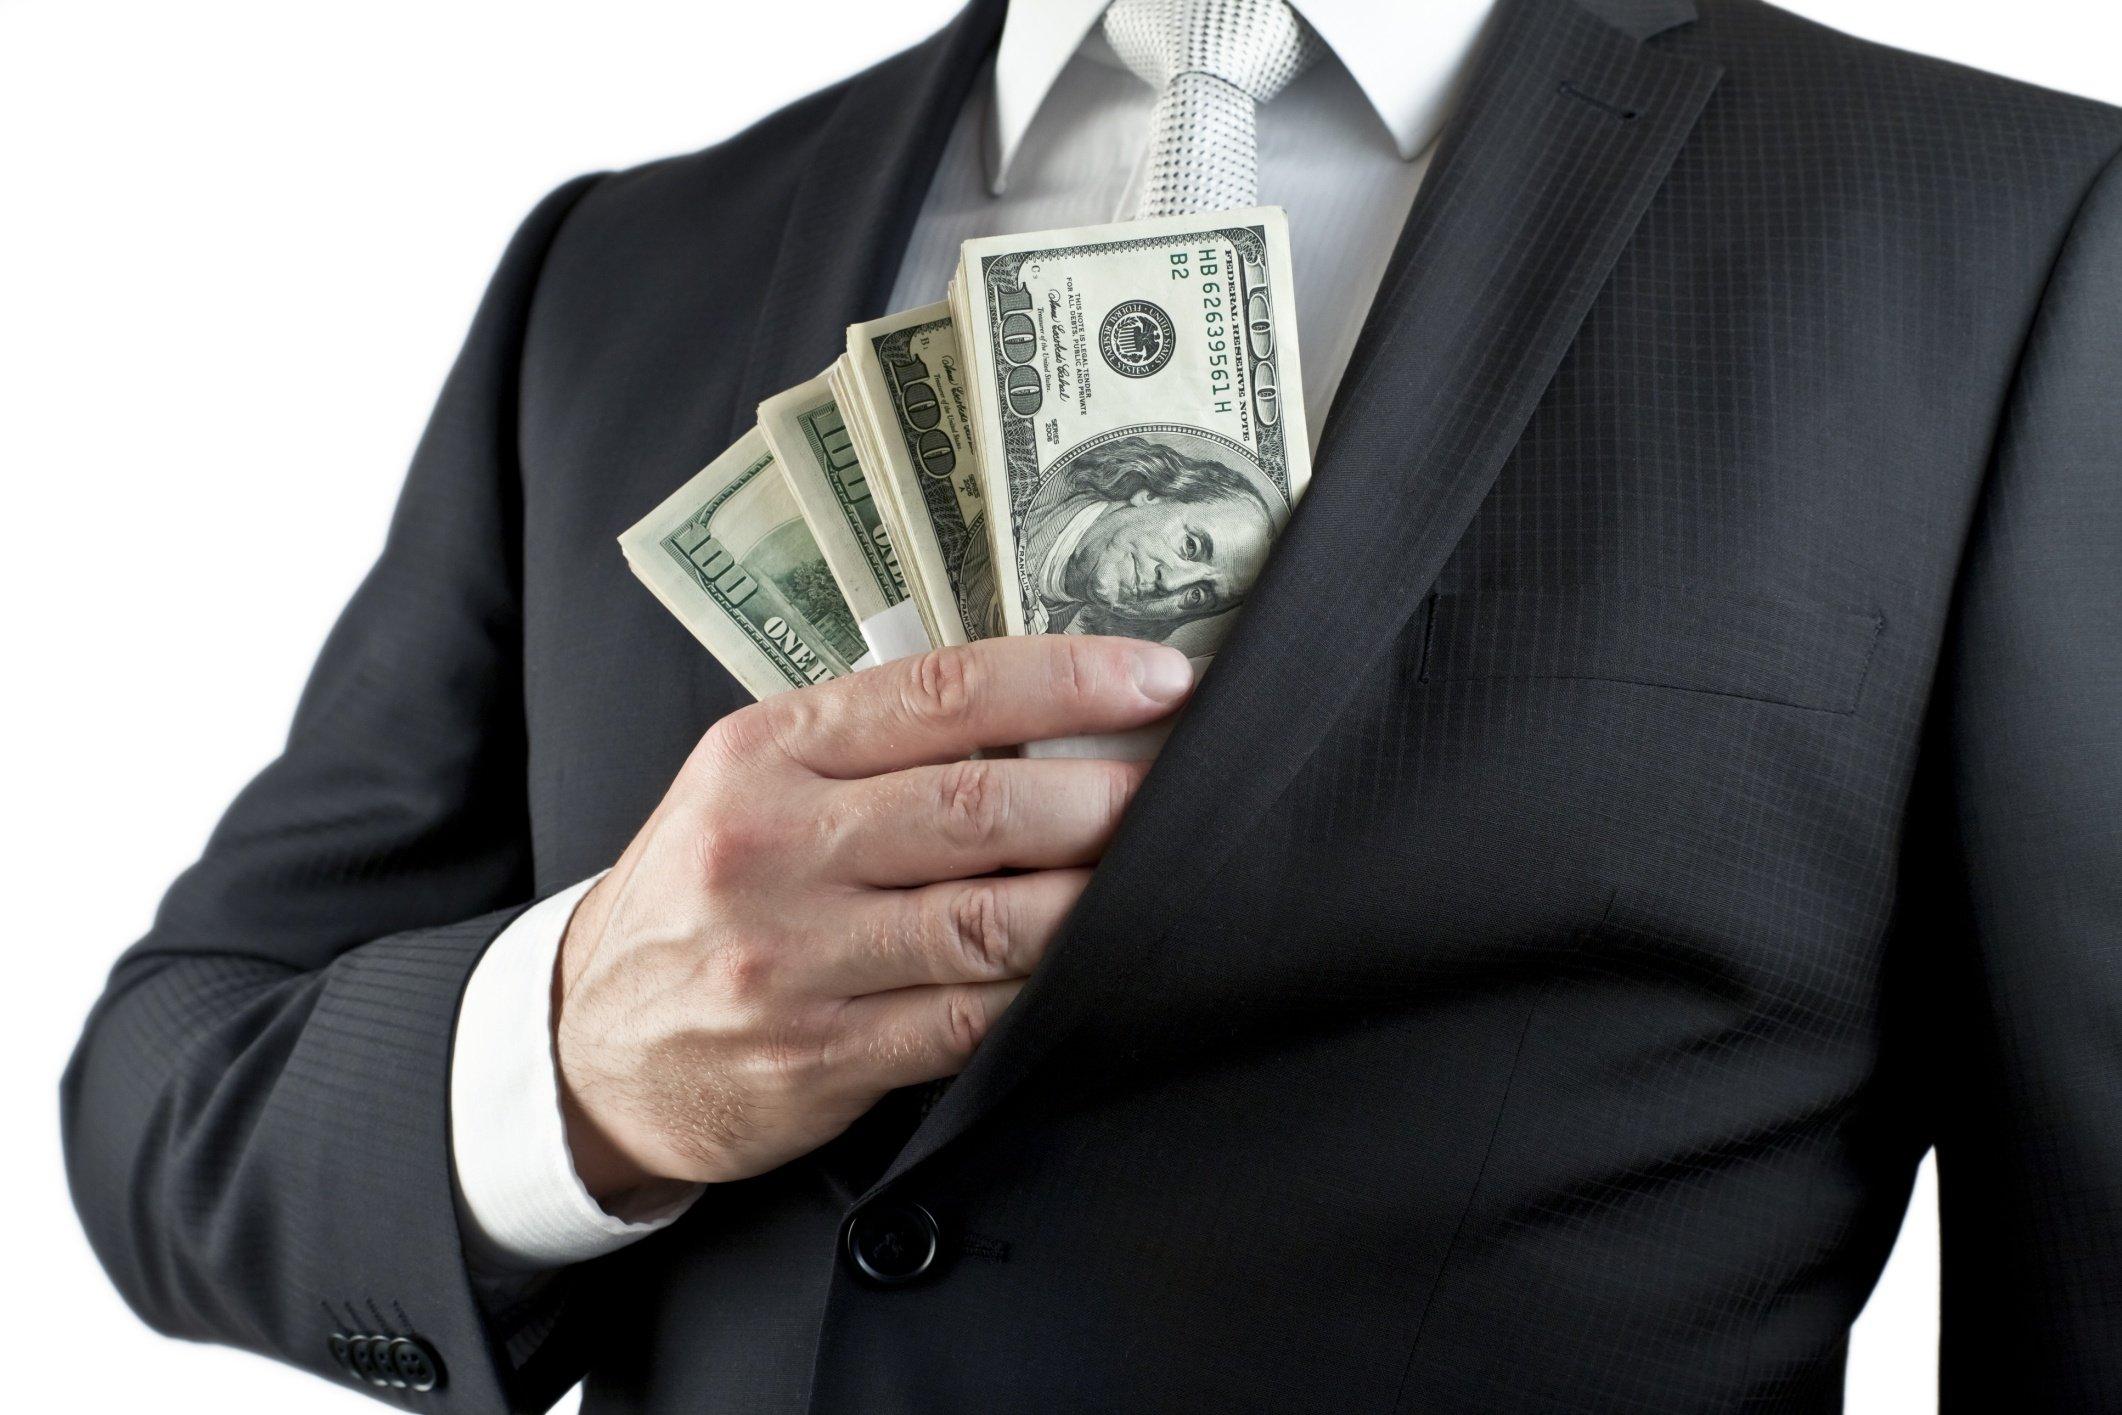 cash_in_pocket.jpg